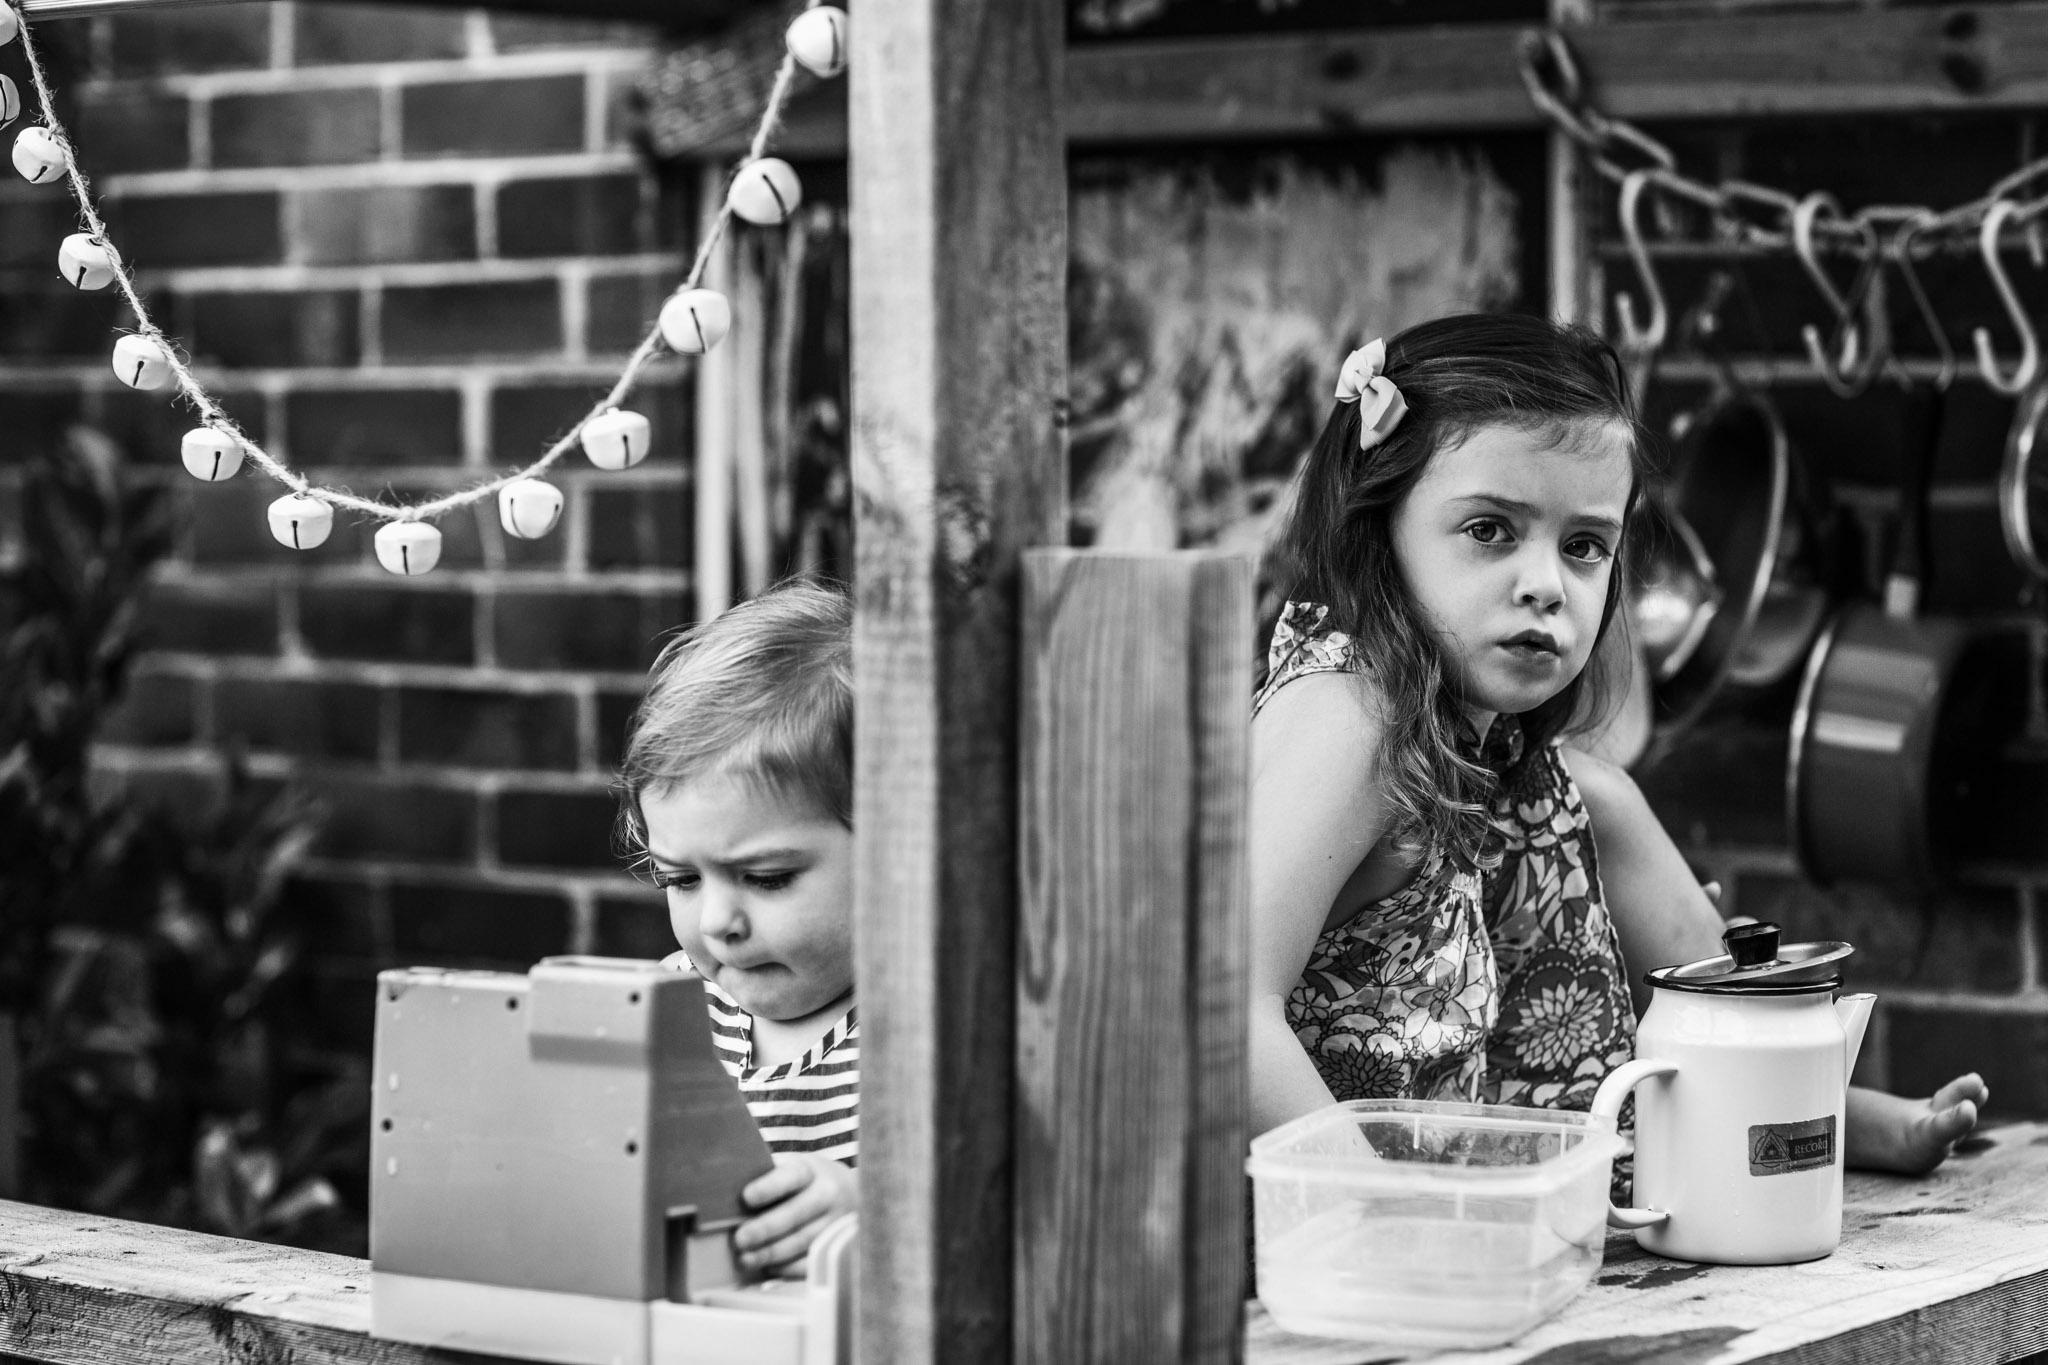 sisters-playing-in-outdoor-cubby-II (1 of 1).jpg